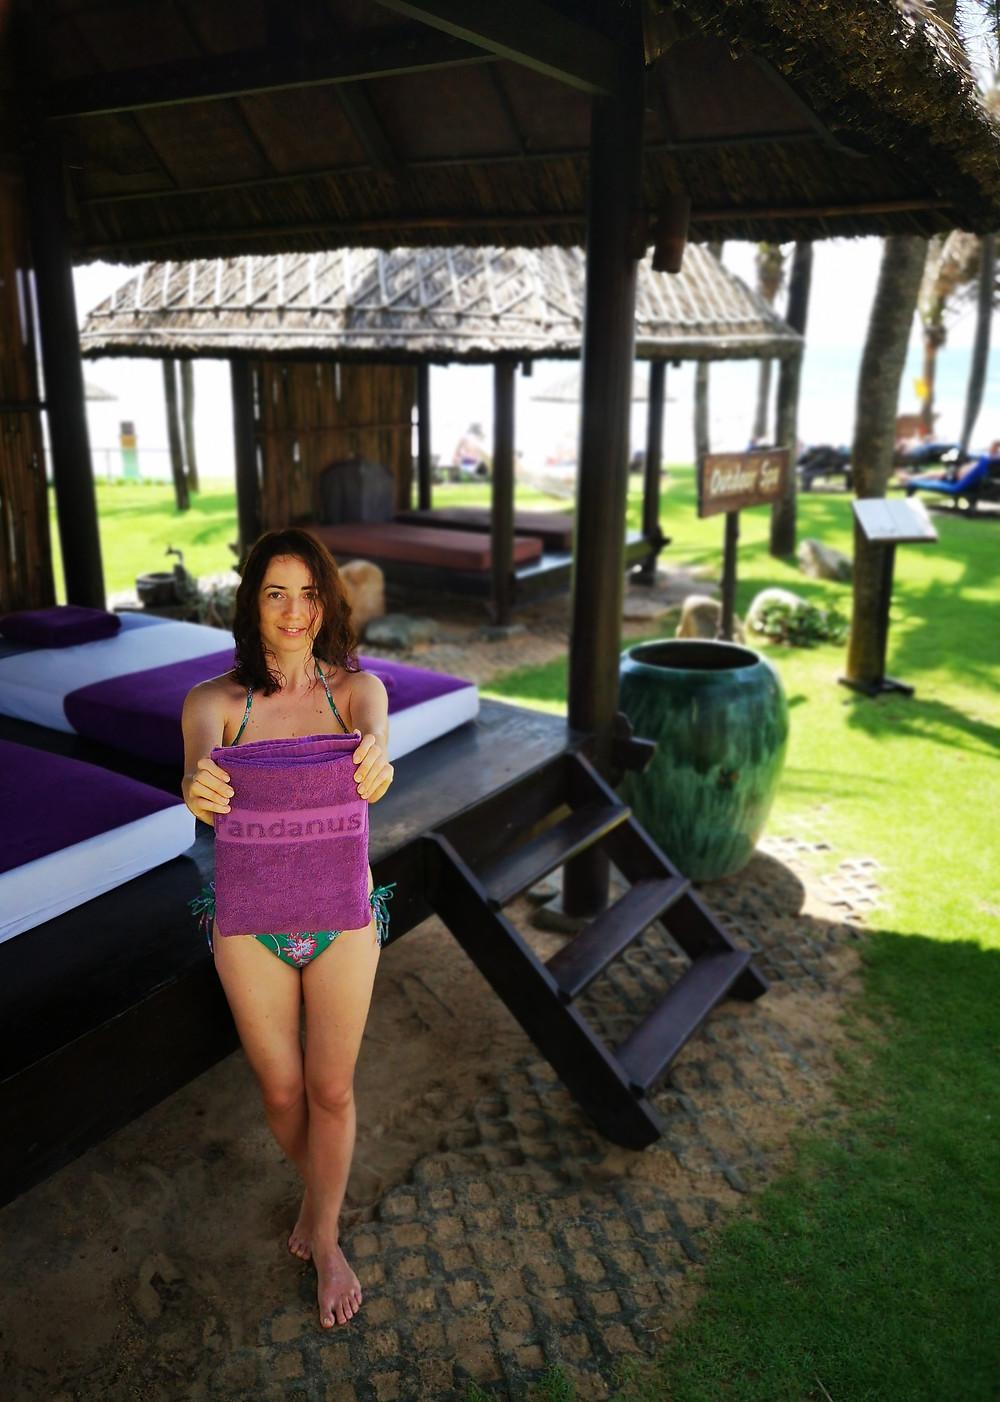 Luxury Spa treatments and massages in Pandanus Resort. Mui Ne, Vietnam